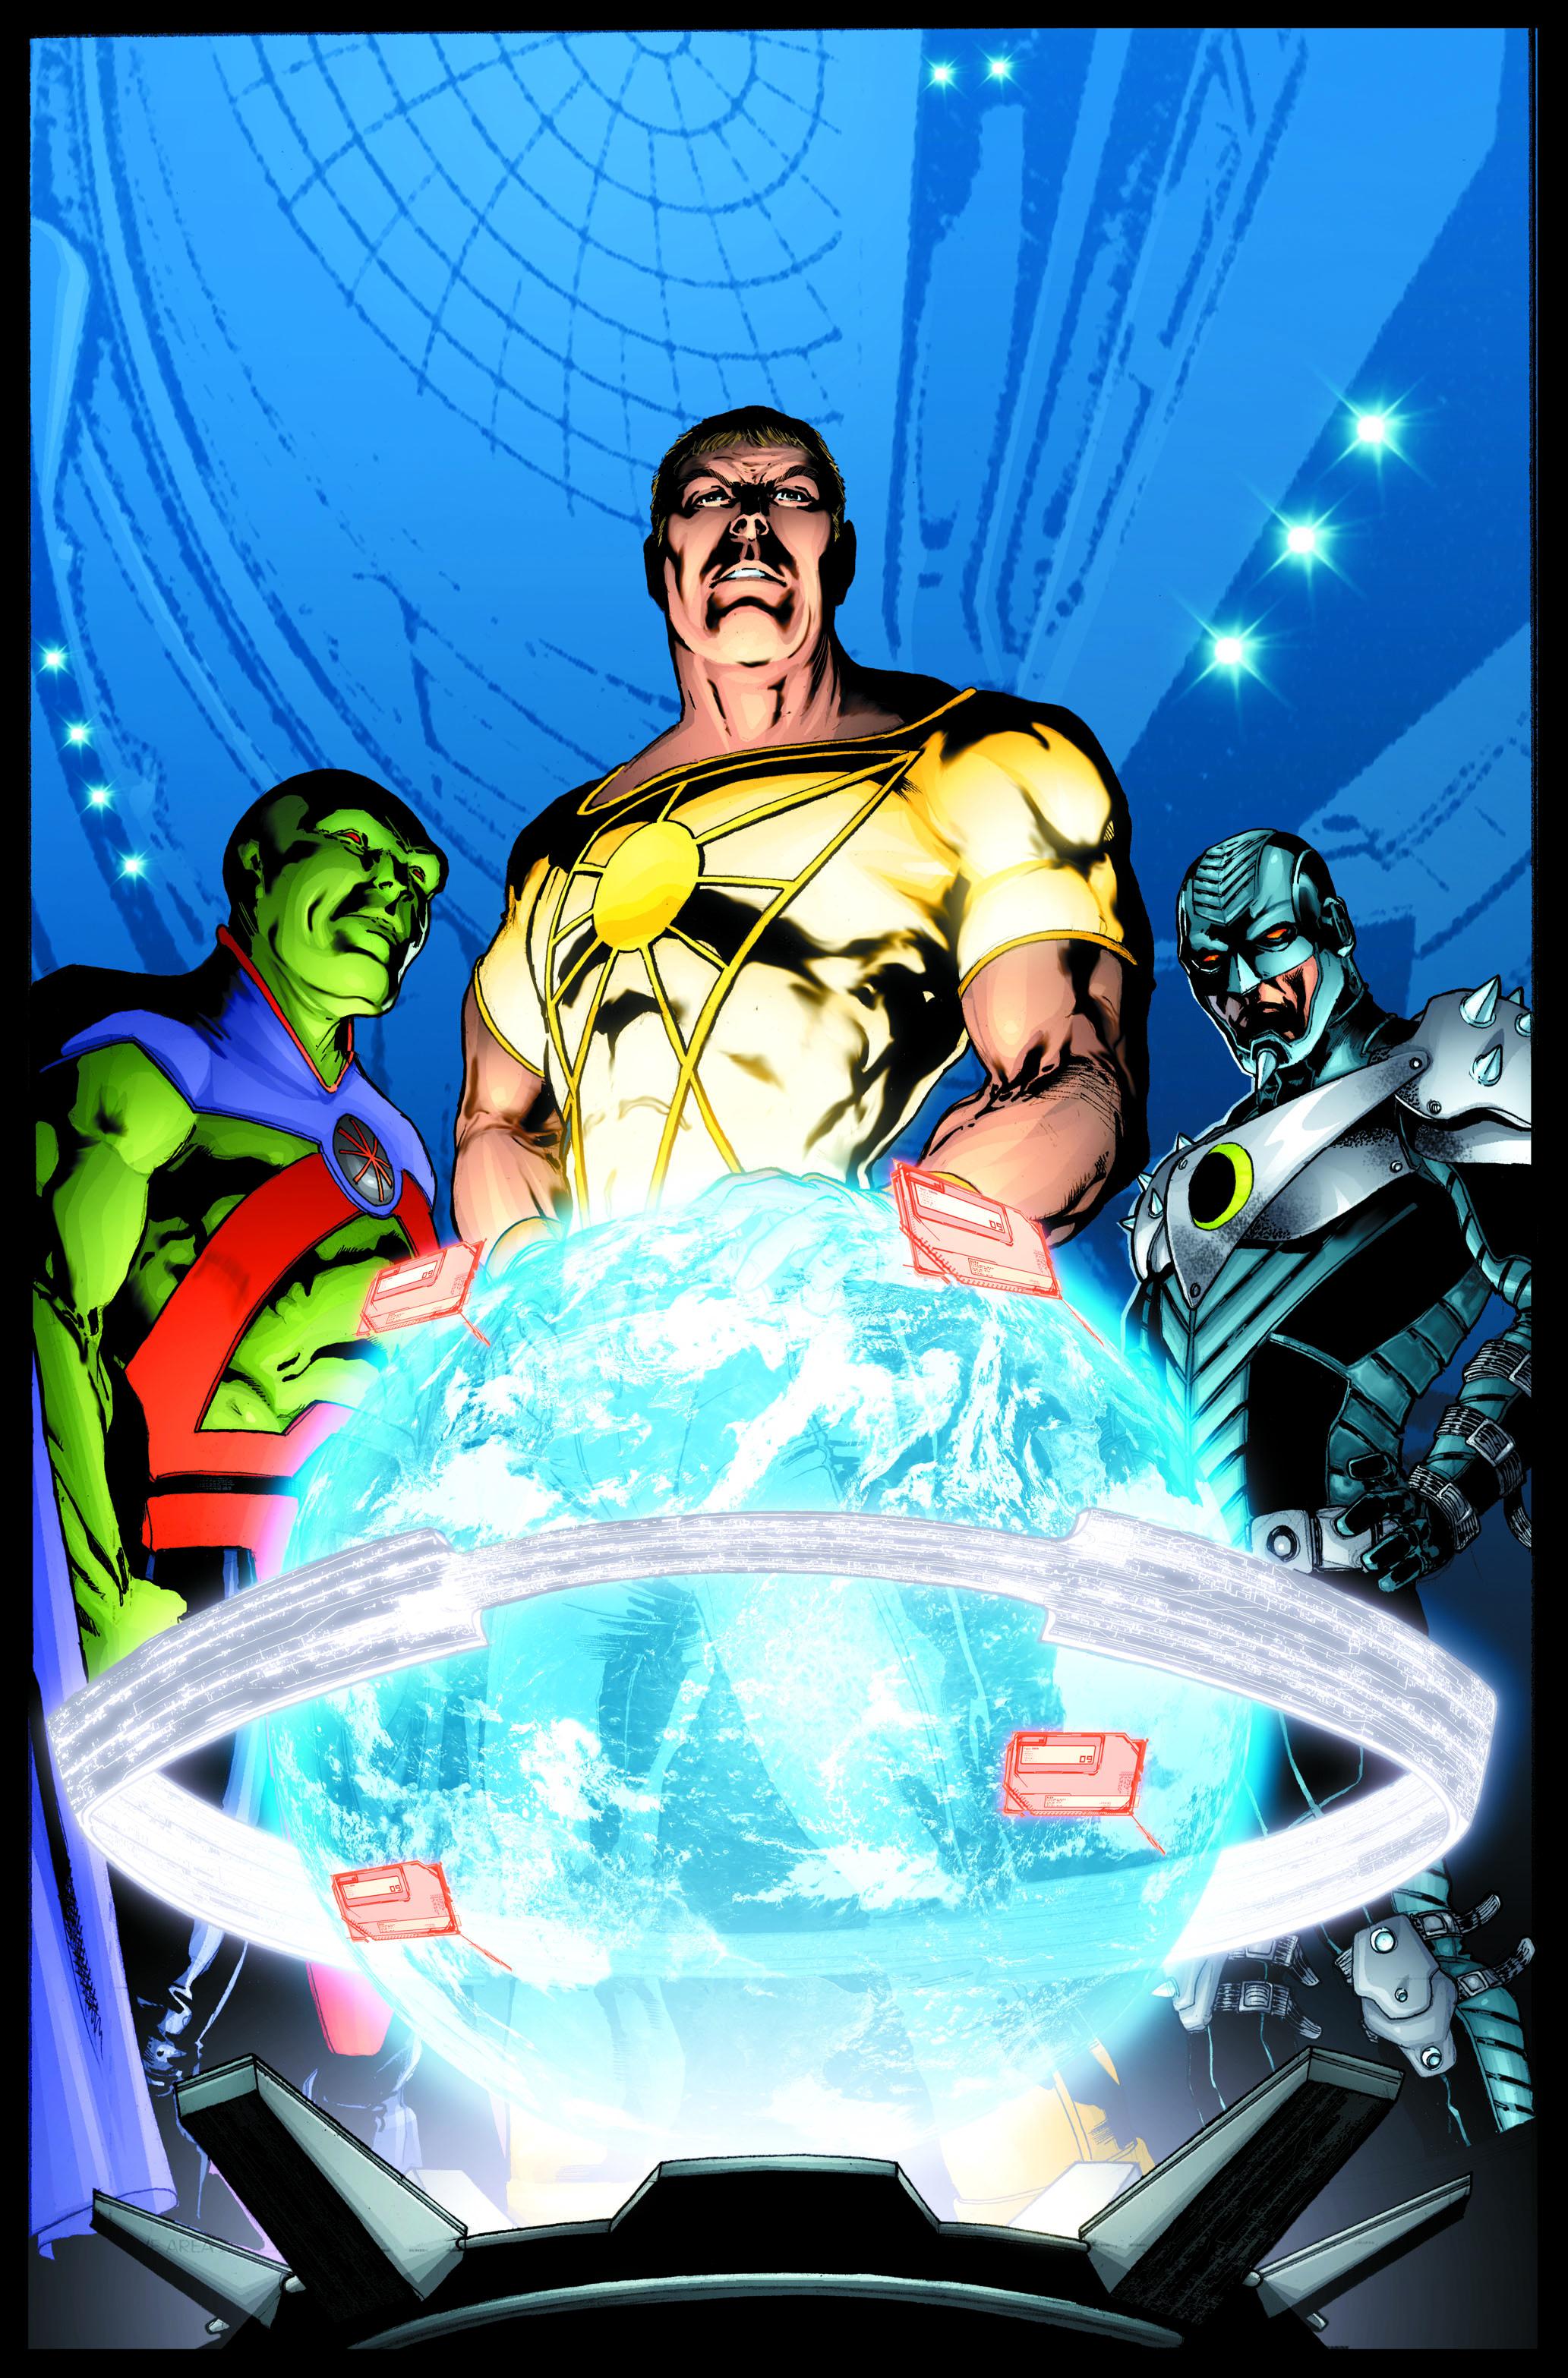 Post Oficial - Nuevo Universo DC Stormwatch_1(imatge)